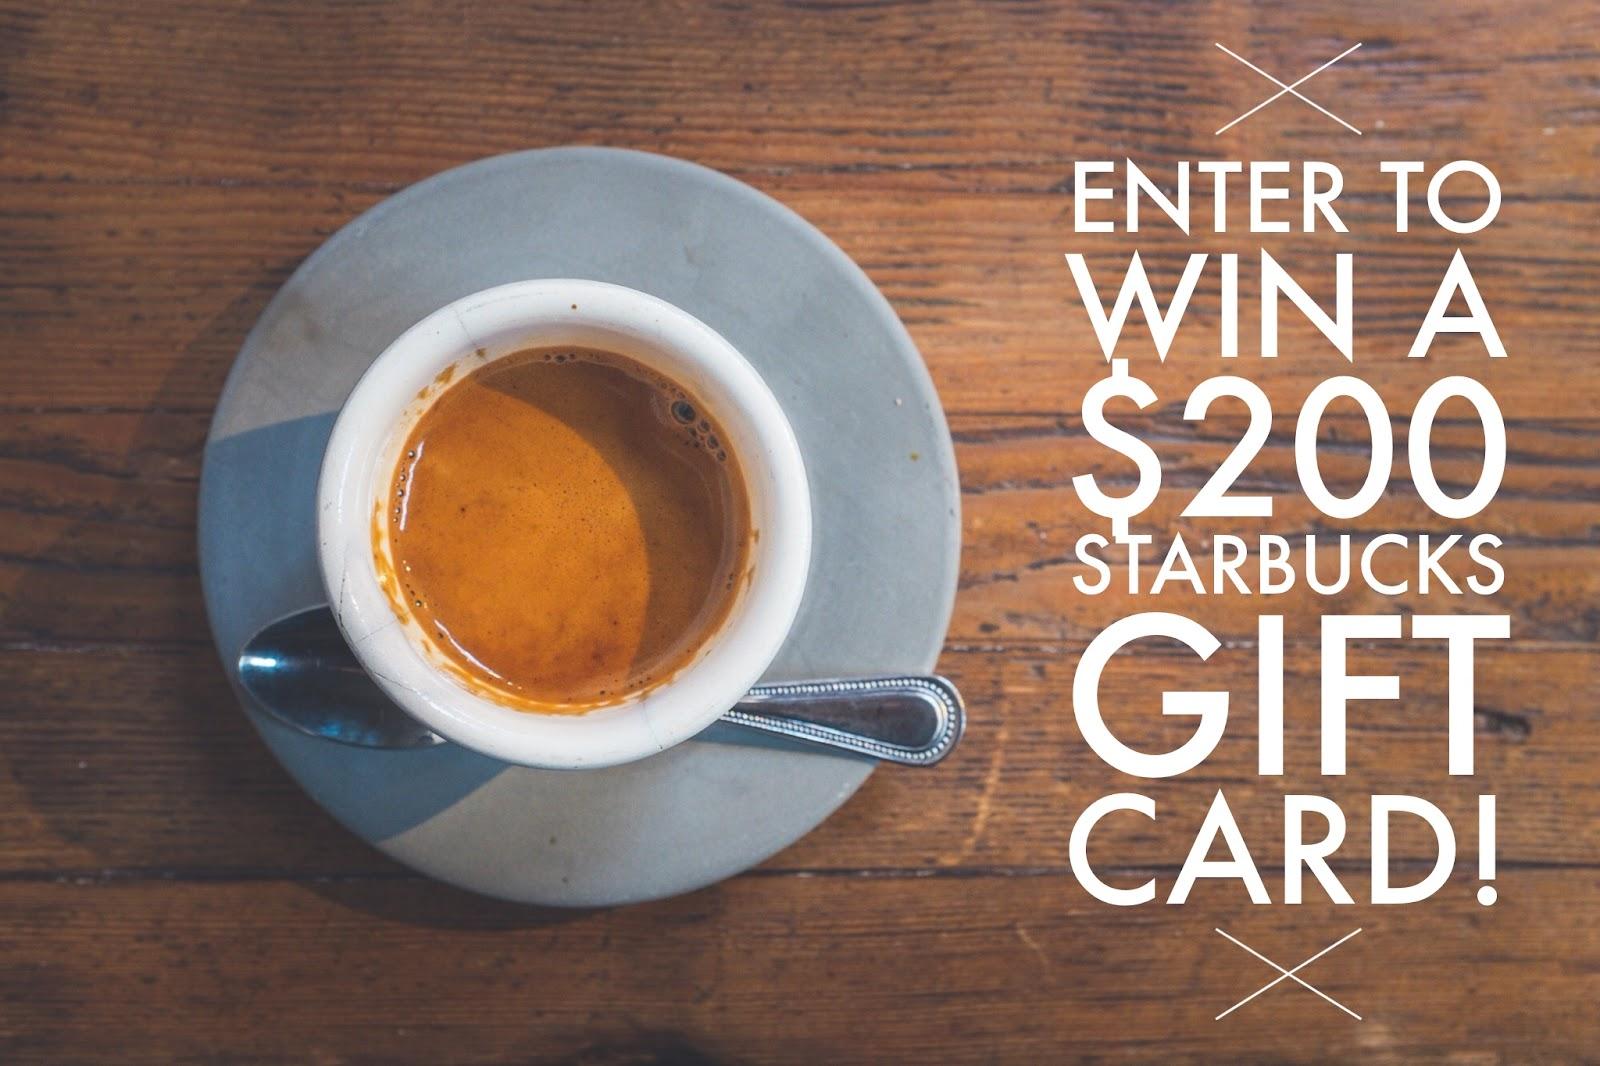 Starbucks $200 GIVEAWAY!